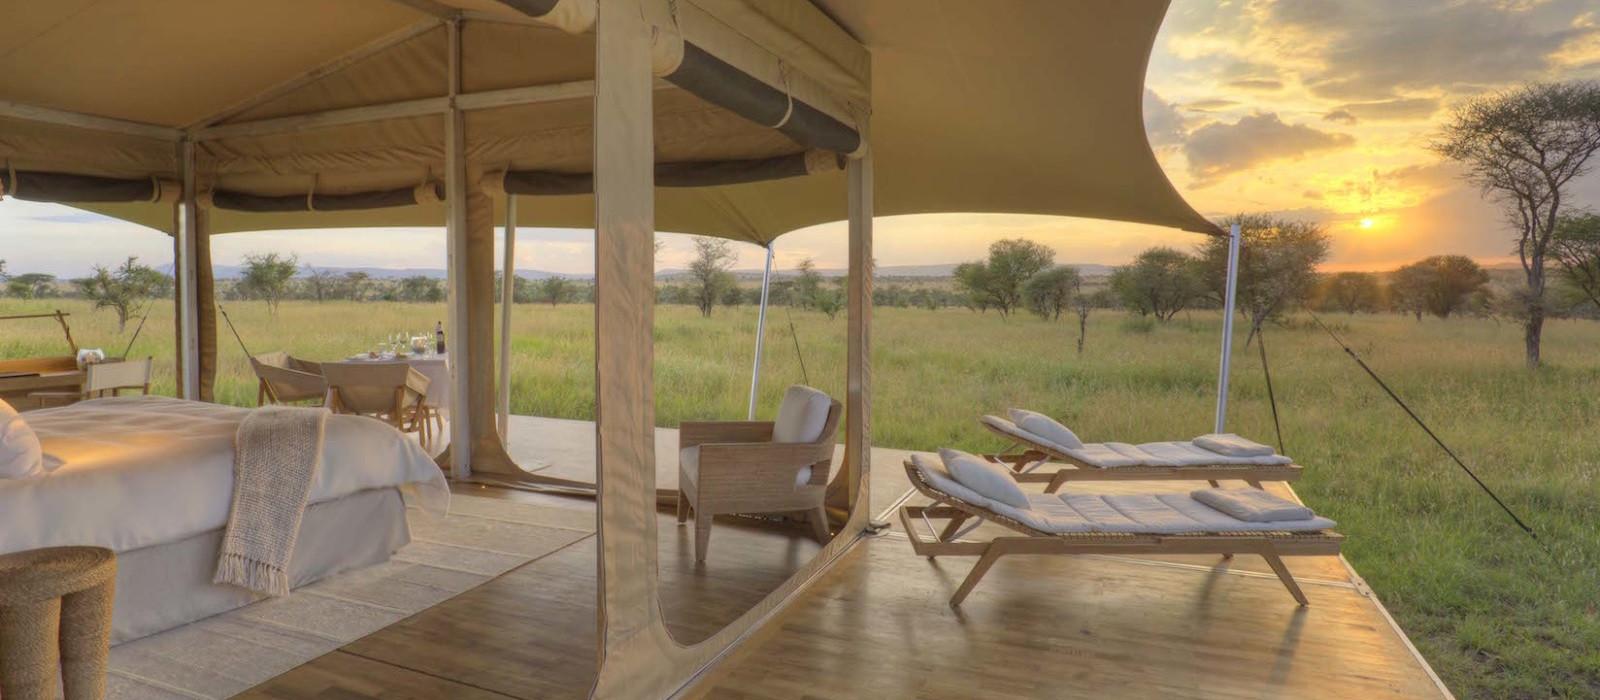 Hotel Mara Bushtops Kenia